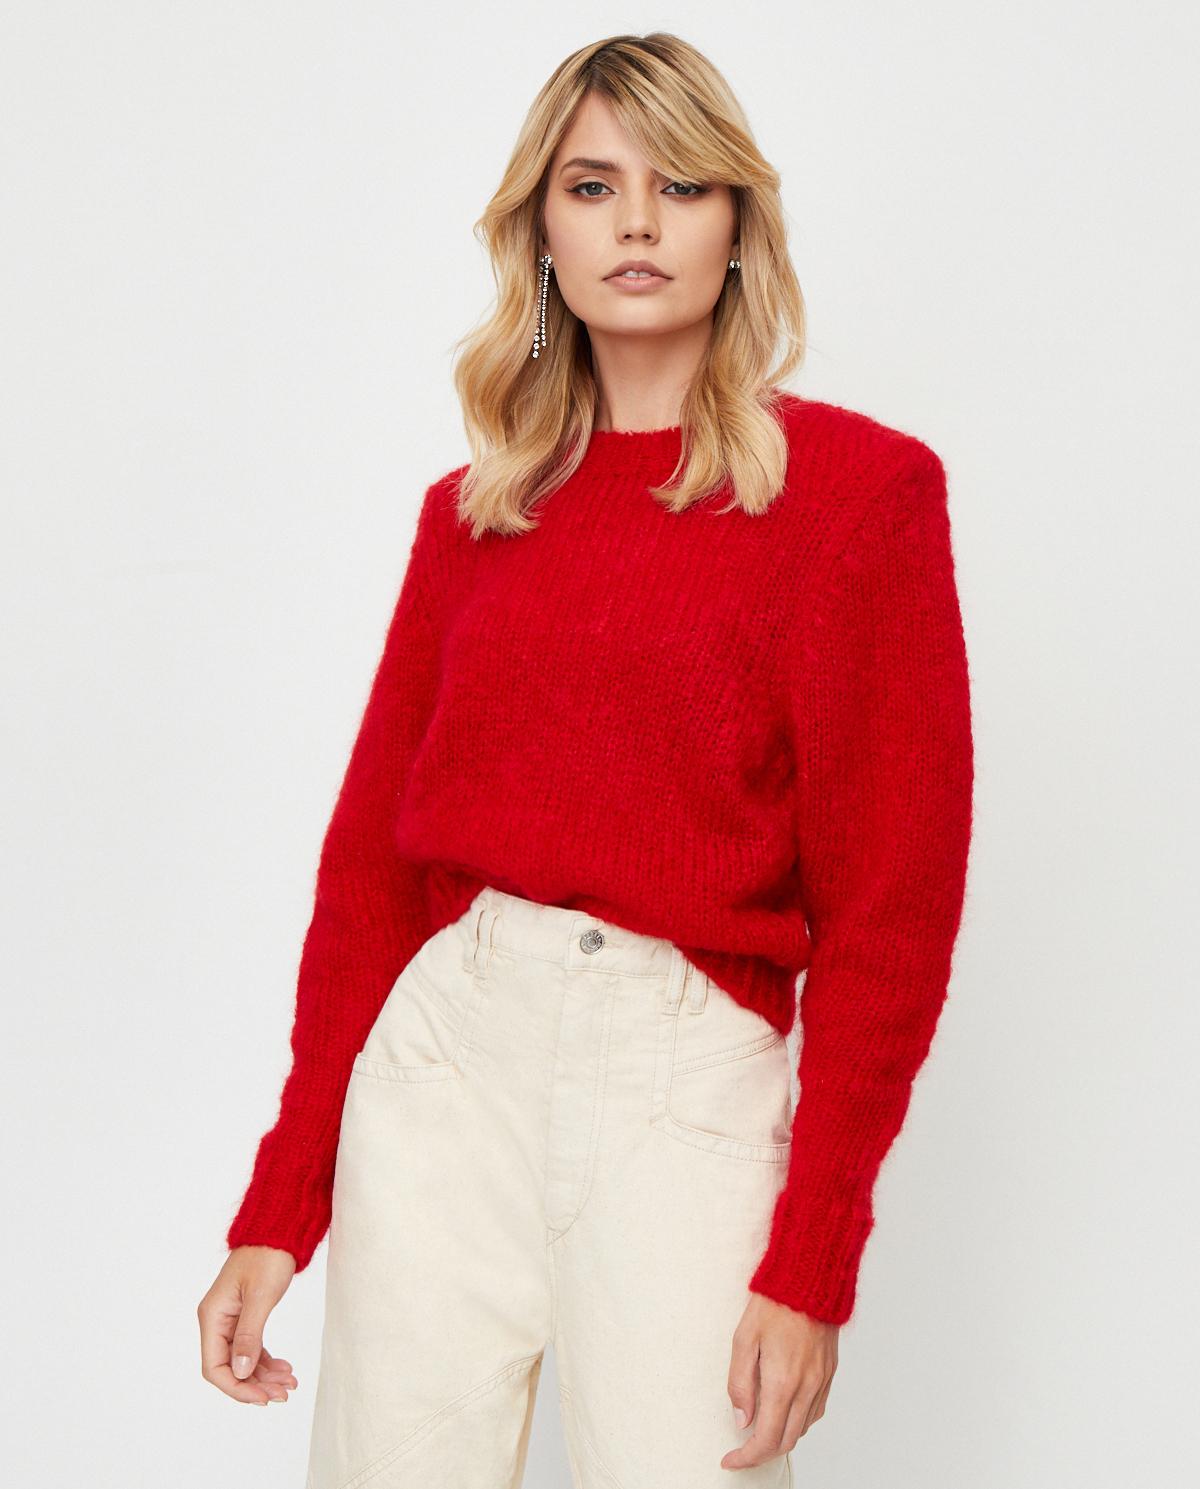 Damski czerwony sweter Idona Isabel Marant PU1256-20P041I 70RD